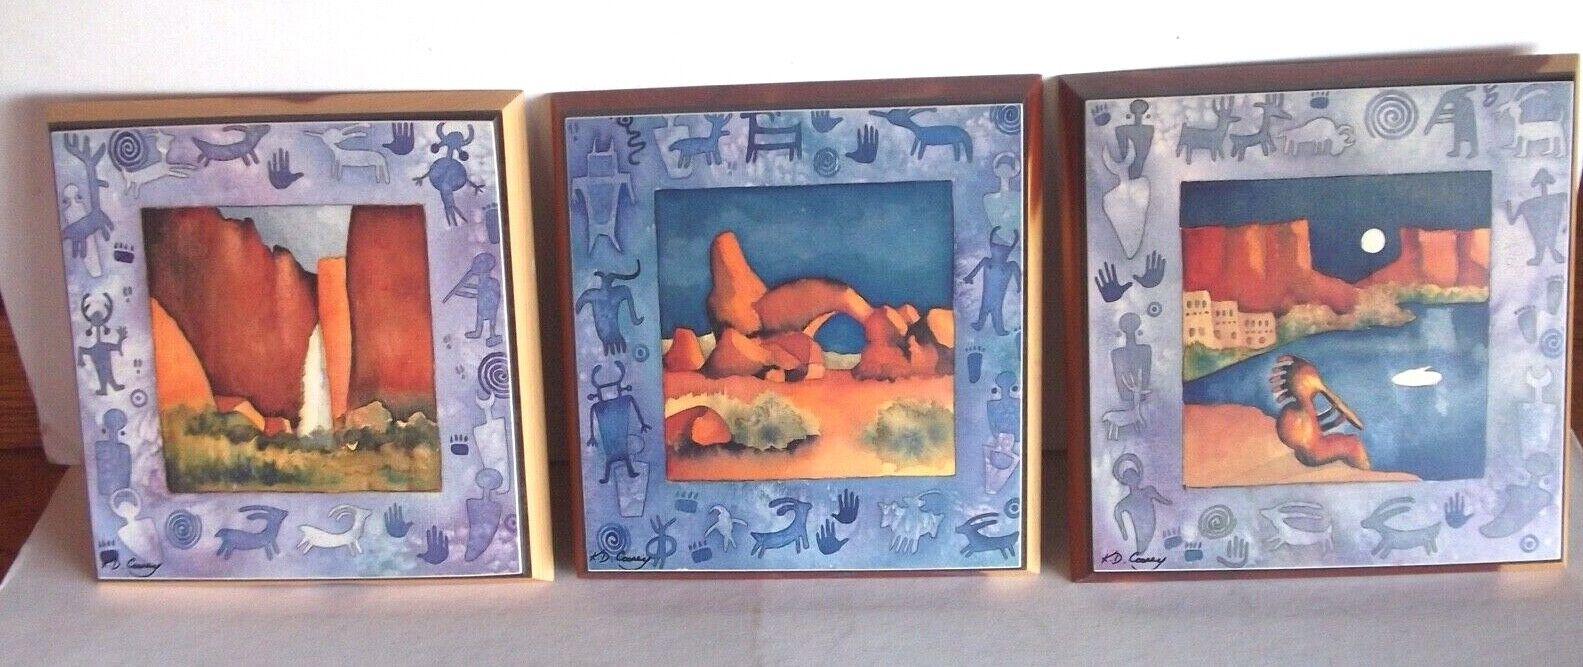 Mystic Moon Wall Plaques (3) Cedar Southwestern Kathy KD Cooney Native Kokopelli